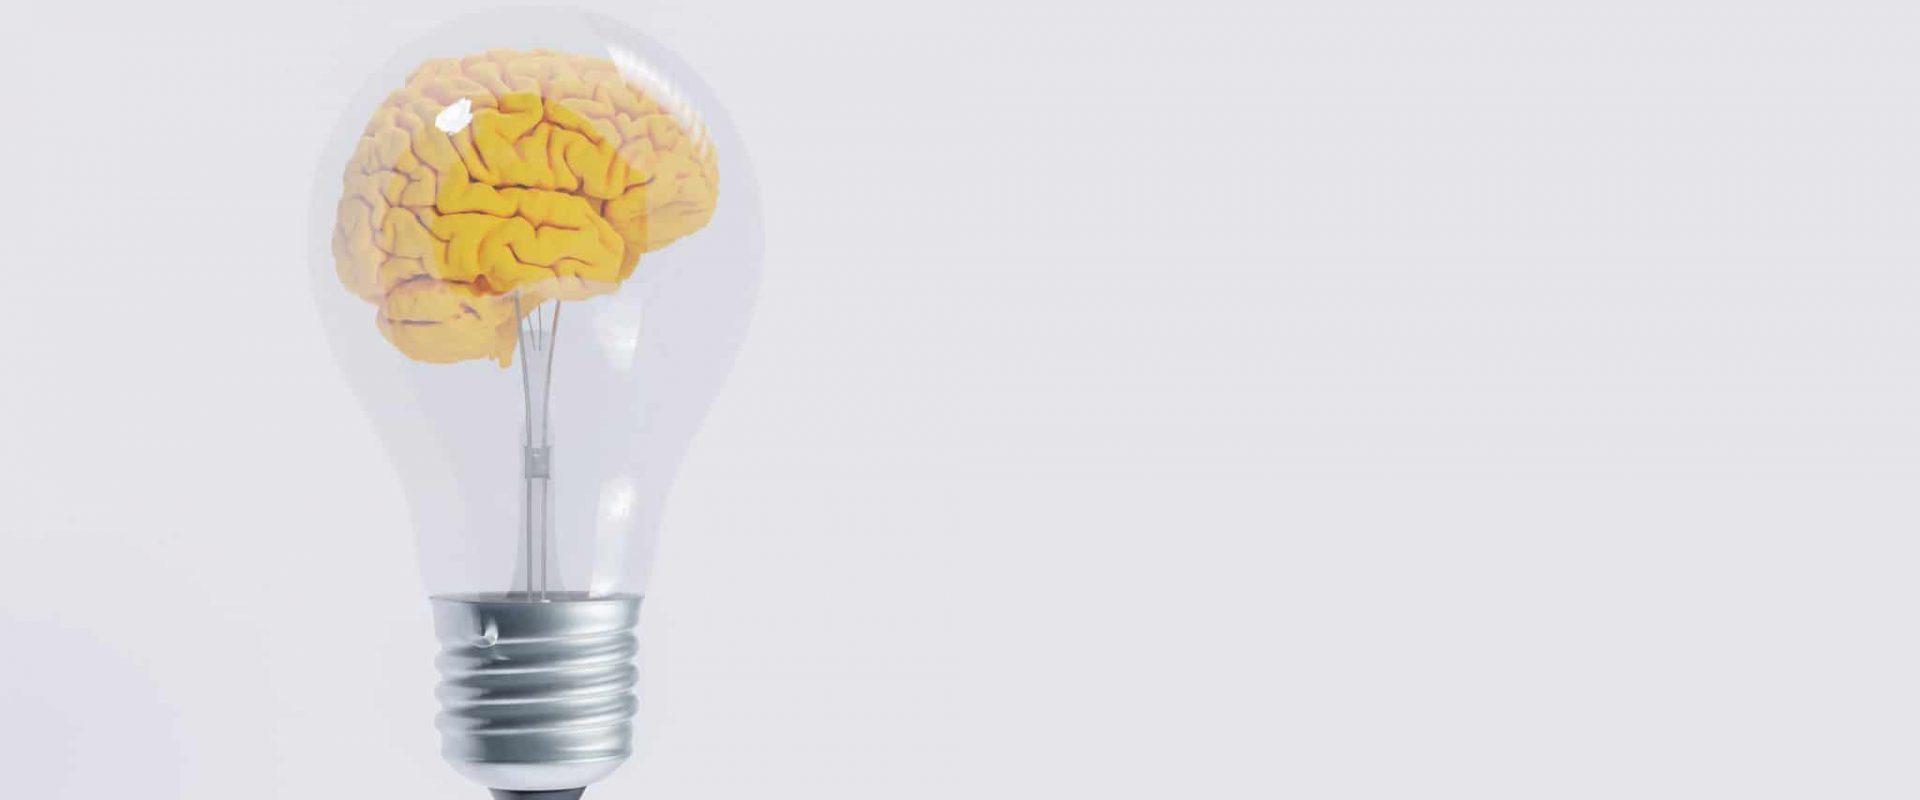 Reptiliengehirn . Elementartraining